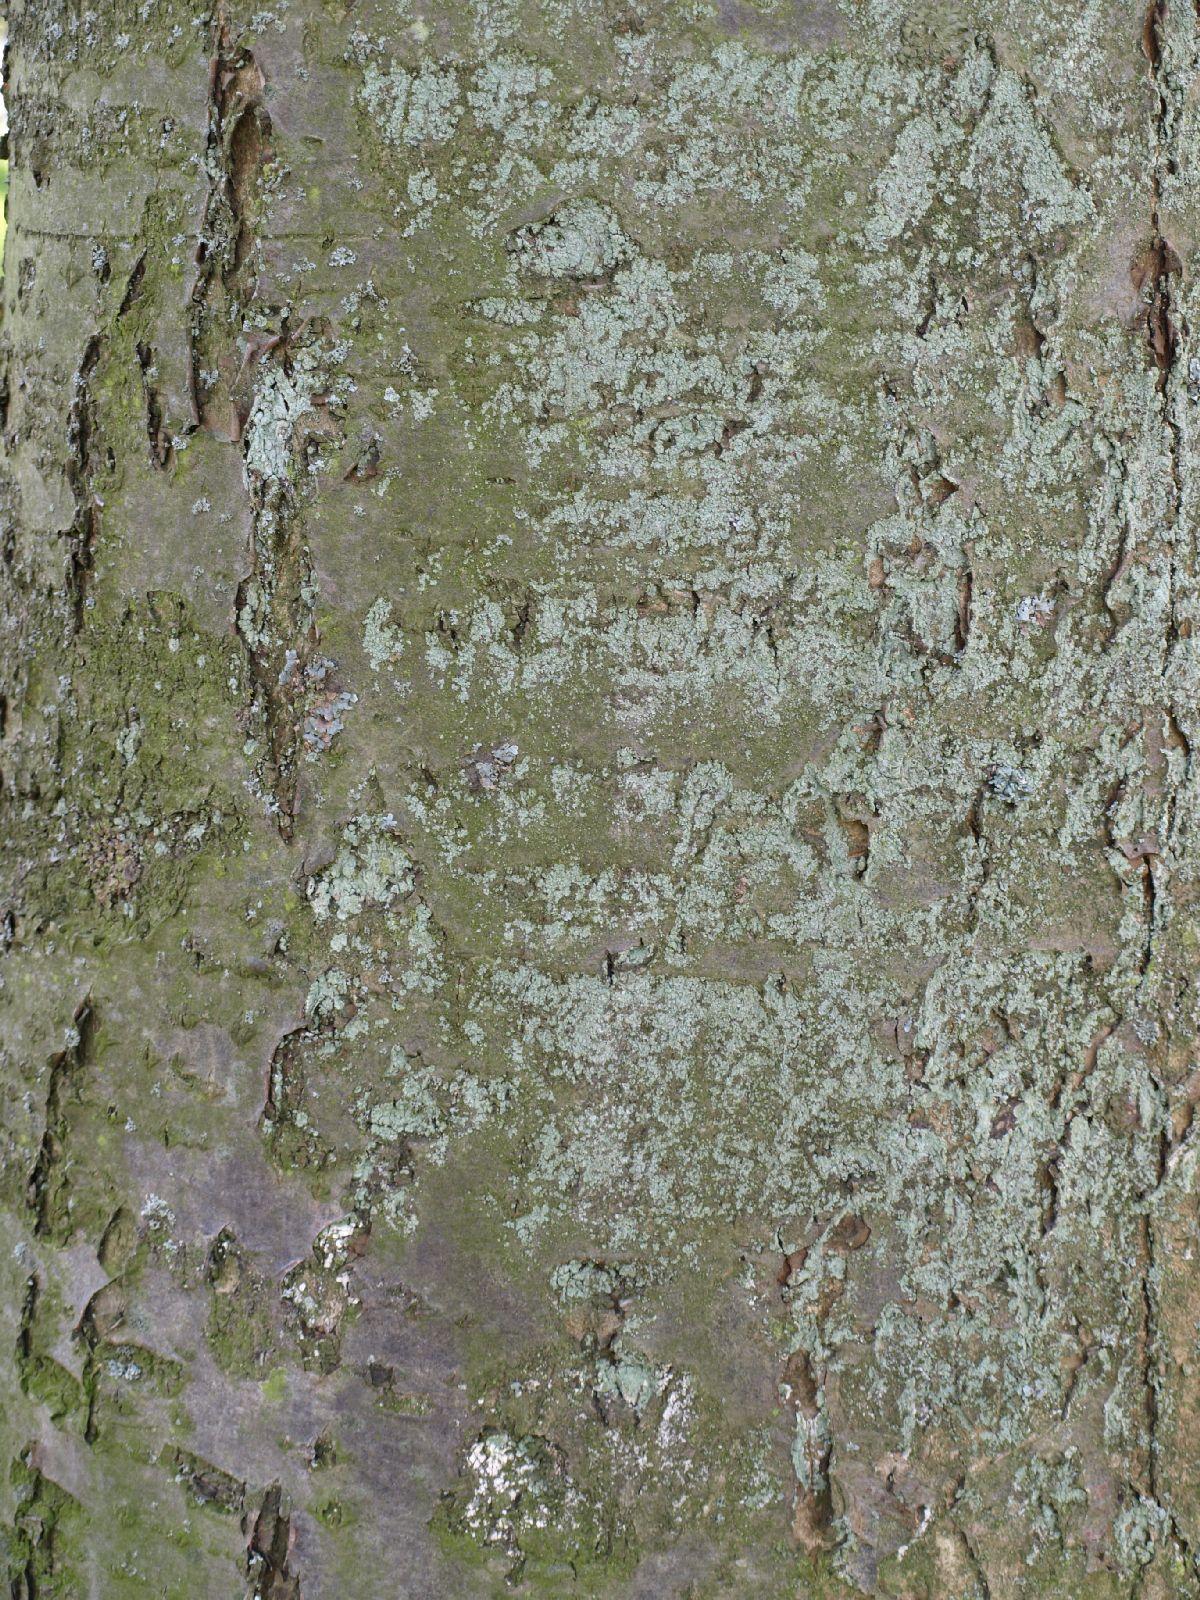 Baum-Rinde_Textur_A_P4120950